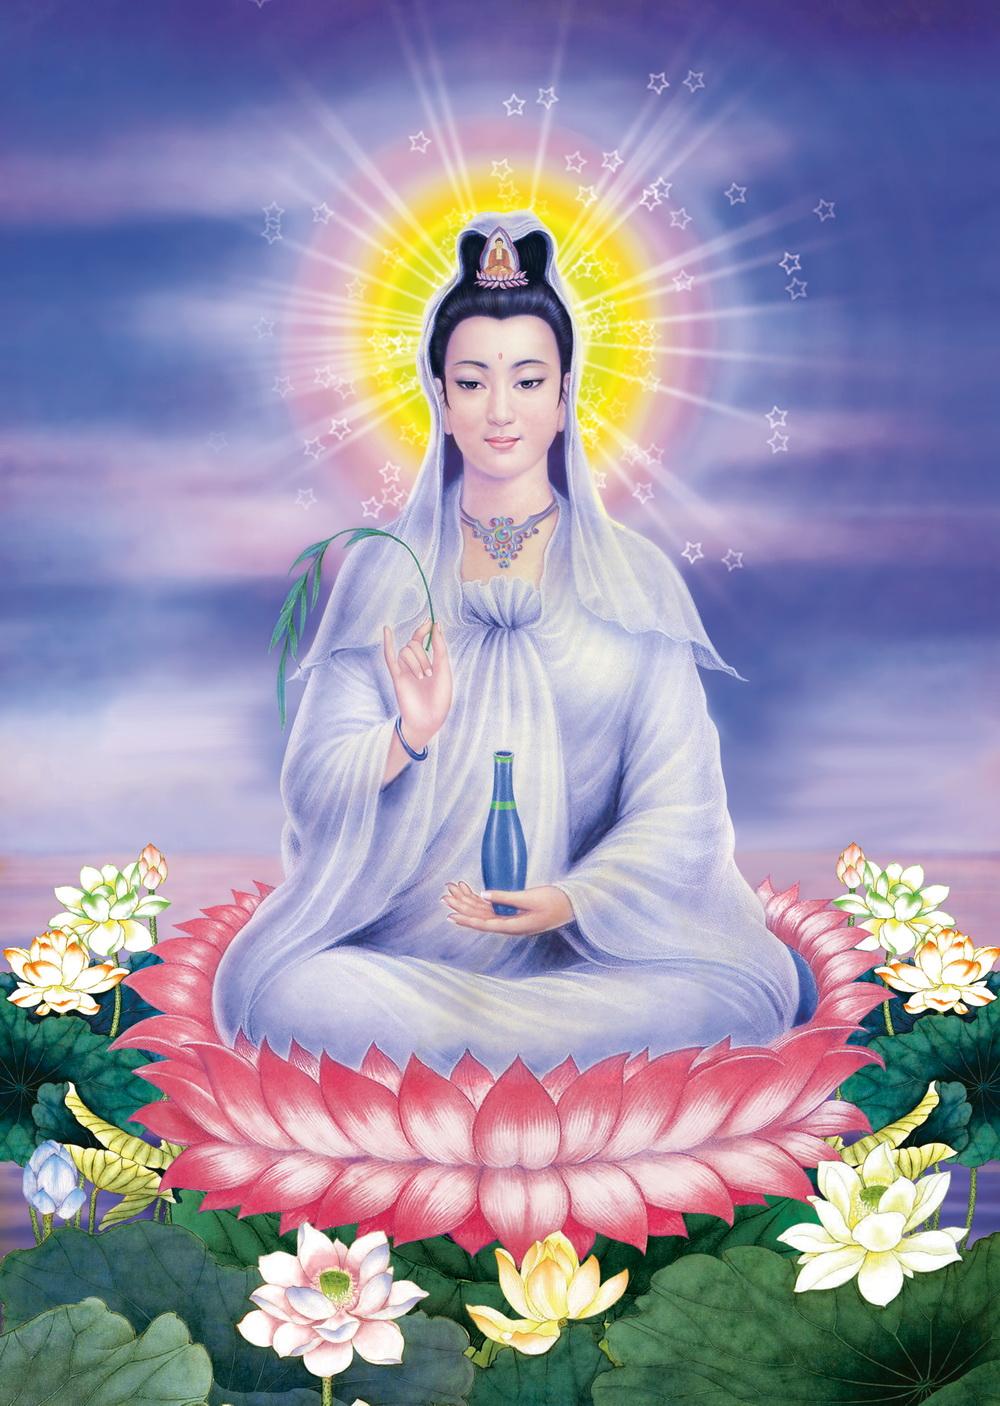 H 236 Nh Quan Thế 194 M Bồ T 225 T Lời Phật Dạy